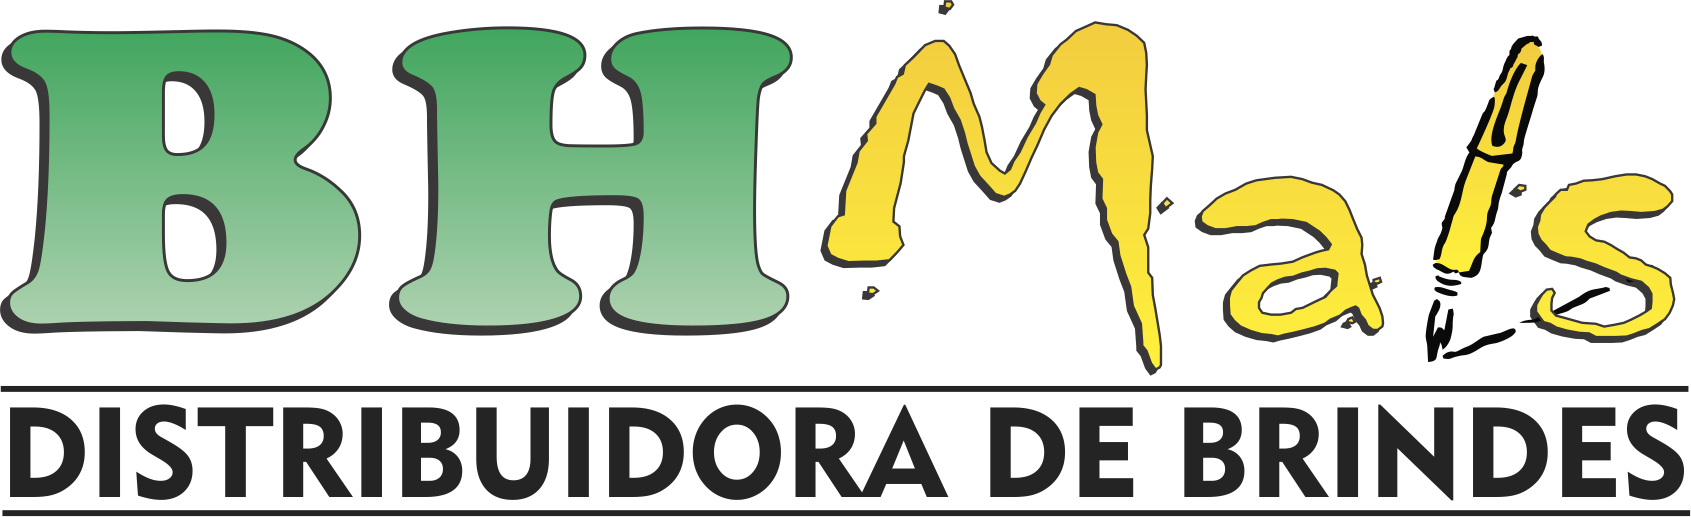 BHMAIS DISTRIBUIDORA DE BRINDES